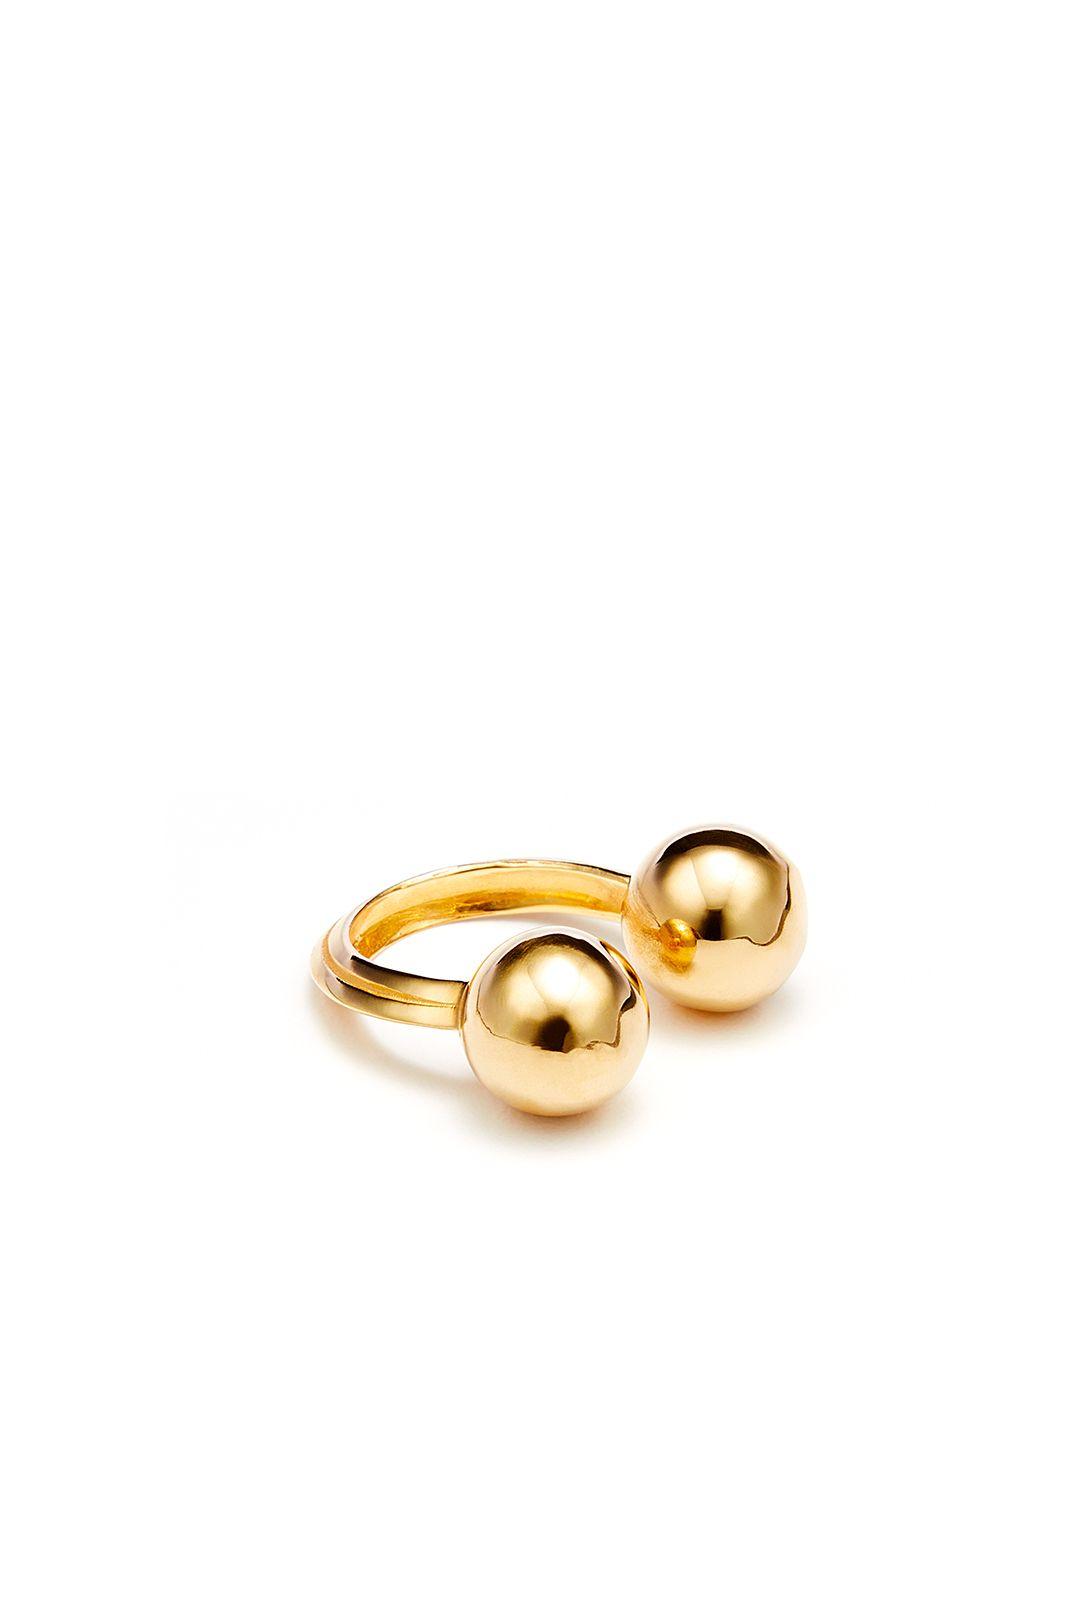 Maya Ball Ring by STANMORE